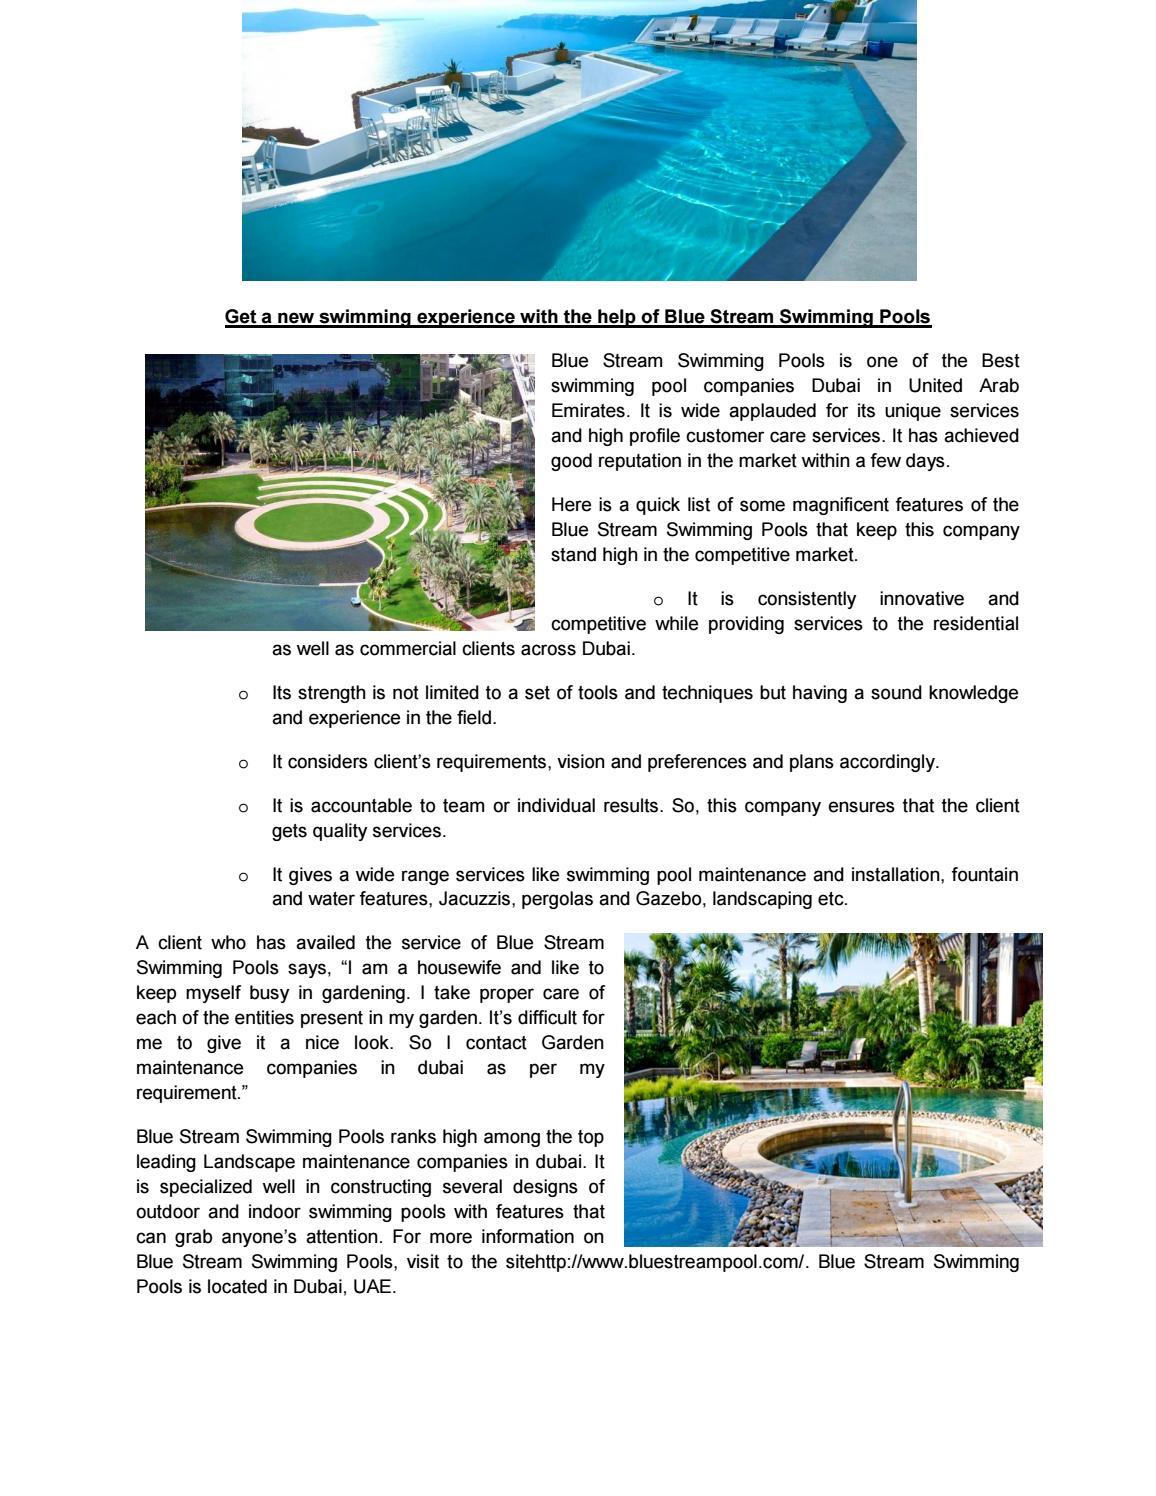 Garden maintenance companies in dubai by Bluestreampool - issuu